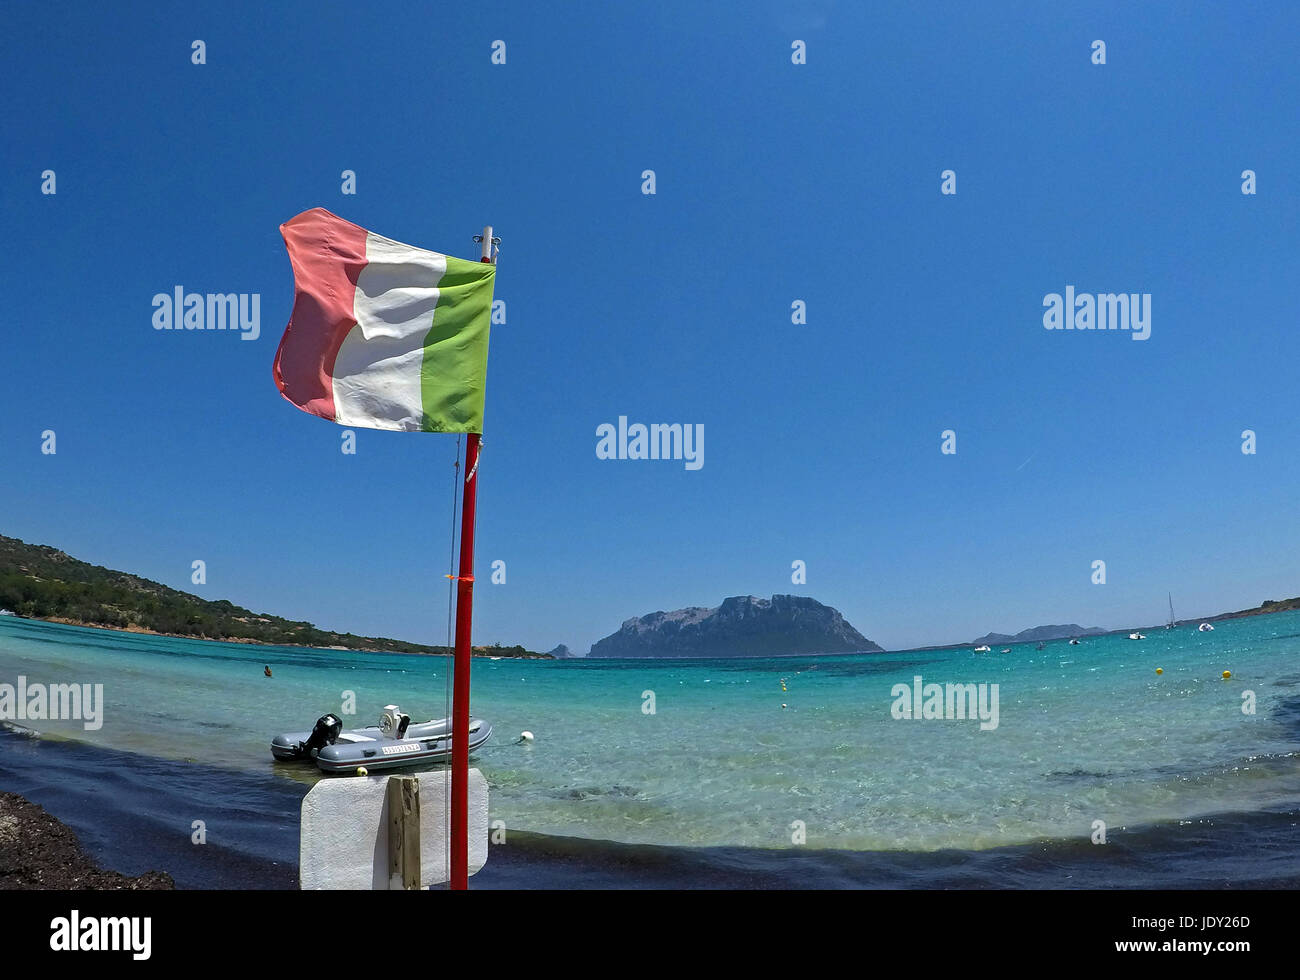 Olbia, Sardinia. Porto Istana beach and the Tavolara Island in the background - Stock Image